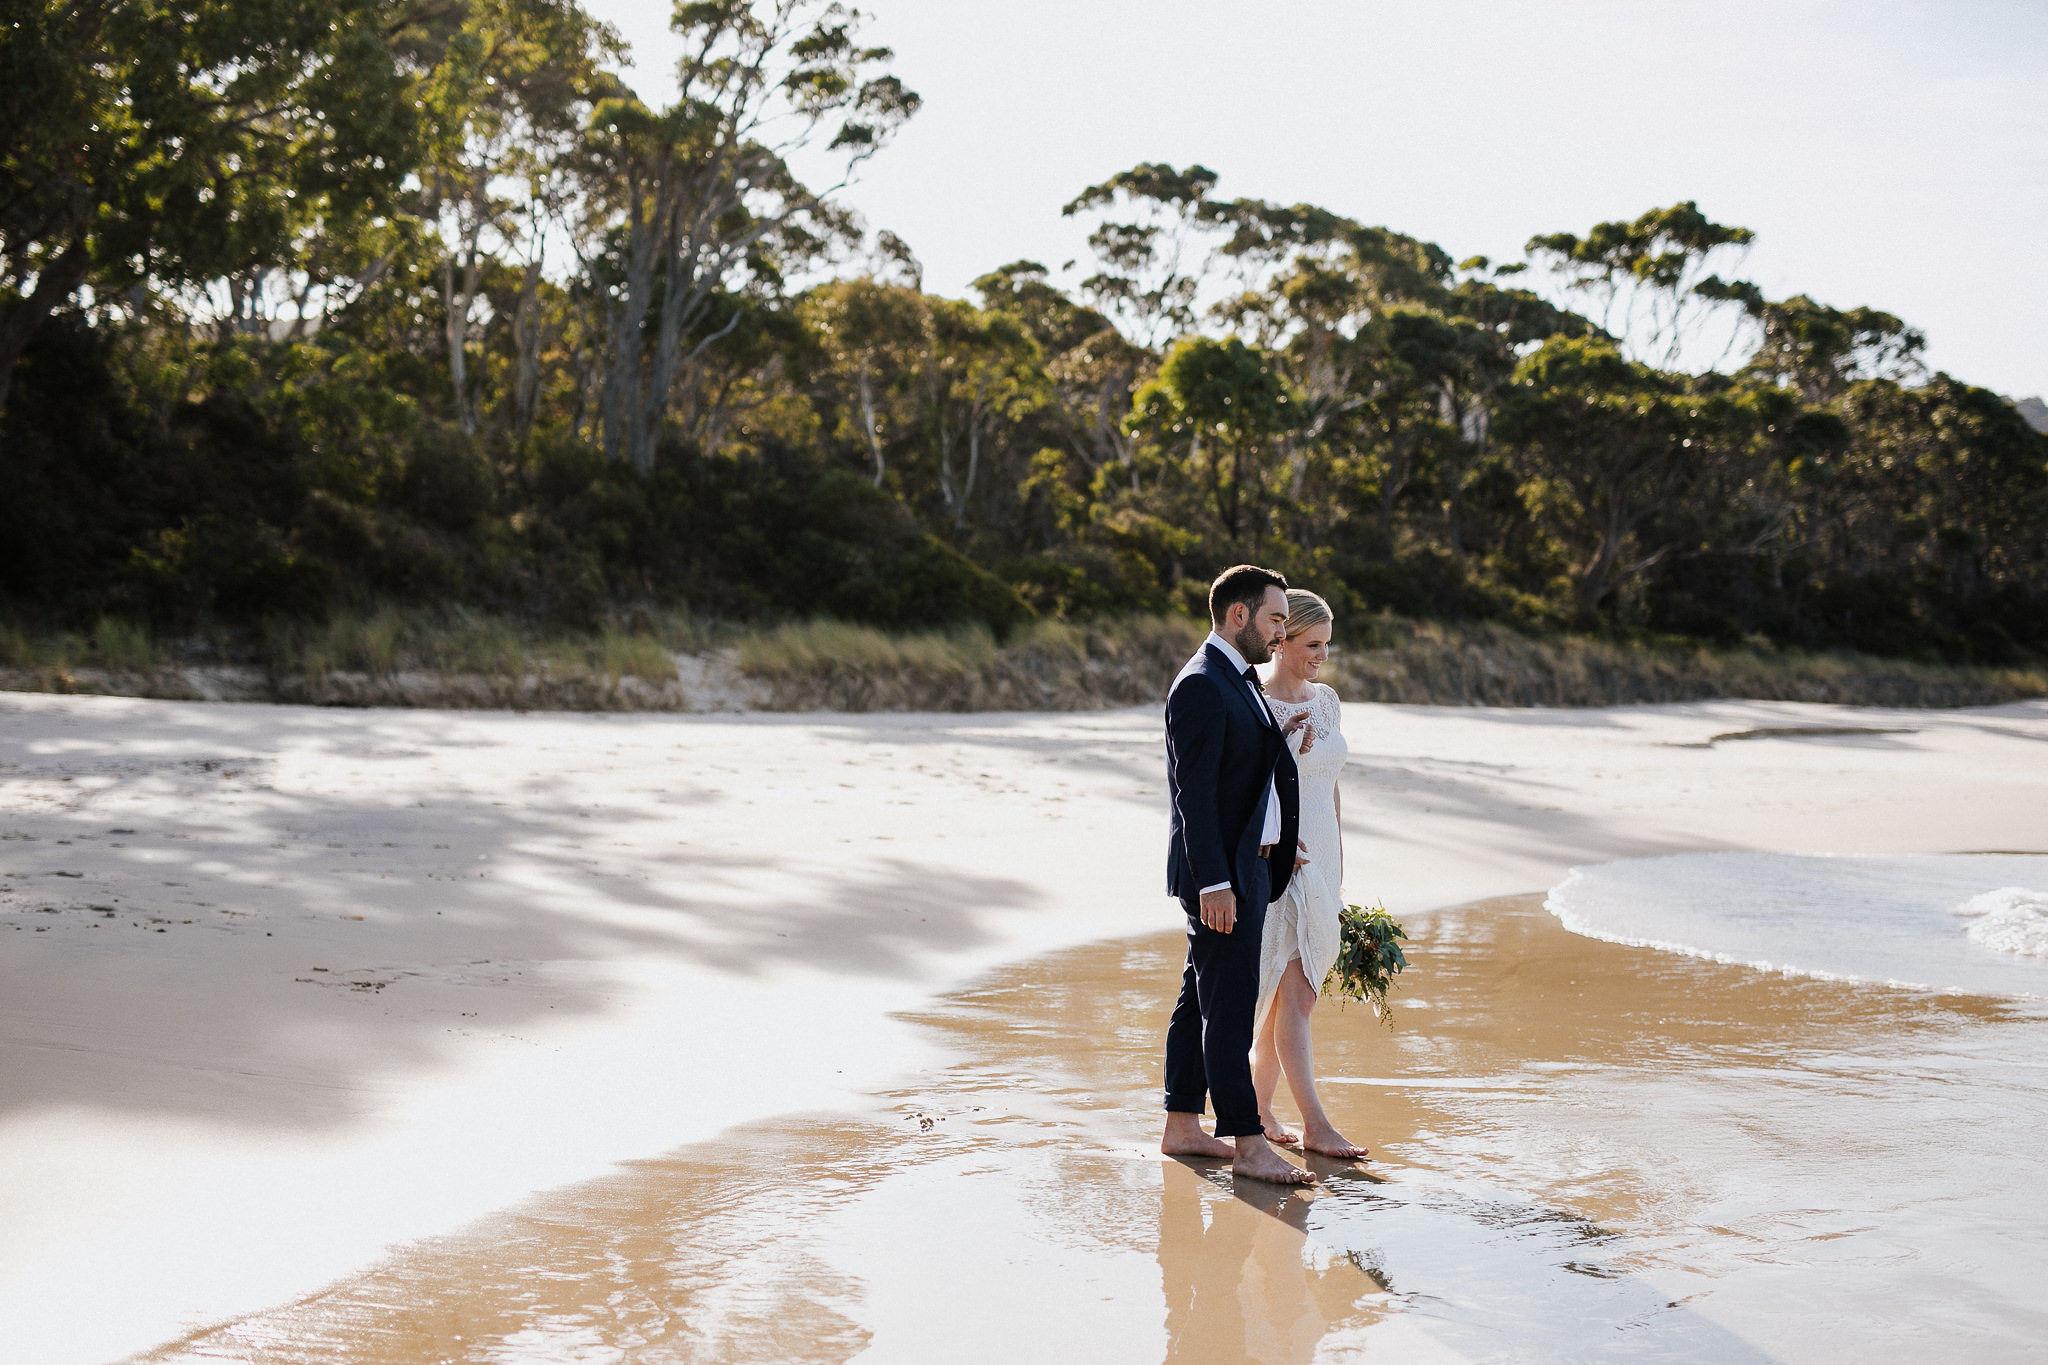 NinaHamilton-TasmanianWeddingPhotographer-Chloe+Nick-OldFarmPortArthur-ShareMe-487.jpg